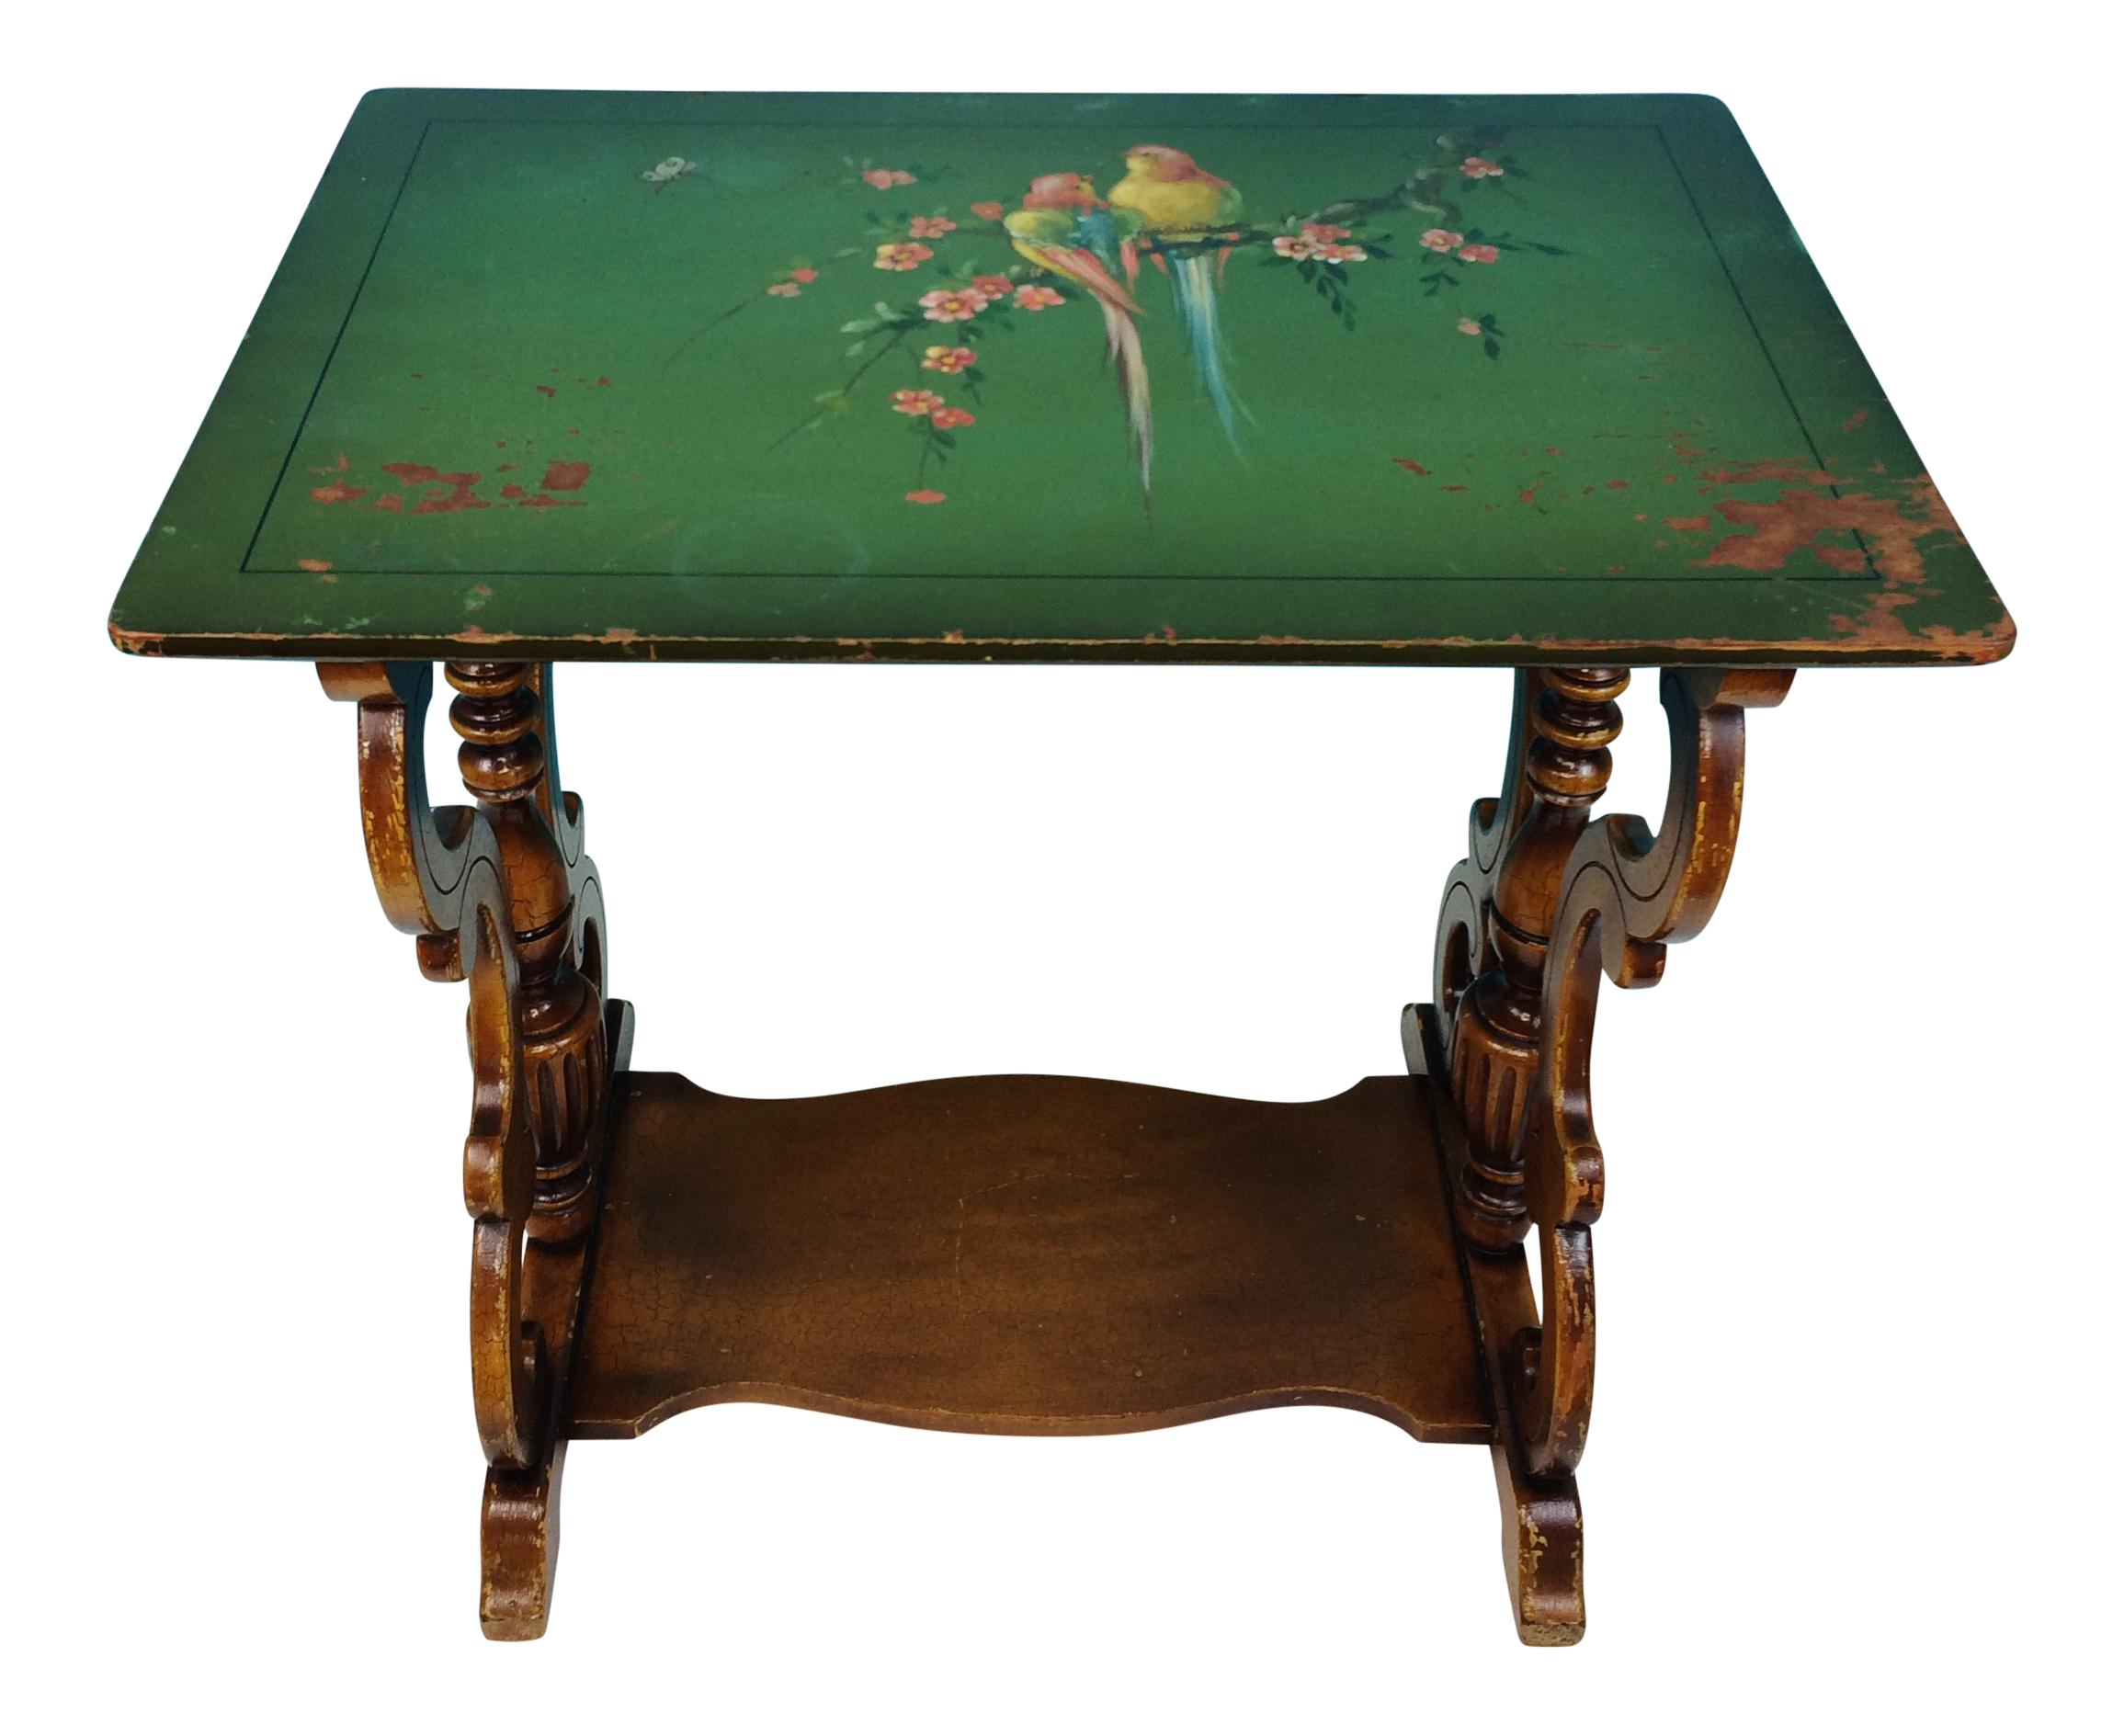 vintage hand painted bird motif wooden accent table chairish wood modern glass coffee designs inexpensive console monarch grey piece set patio furniture las vegas big umbrellas